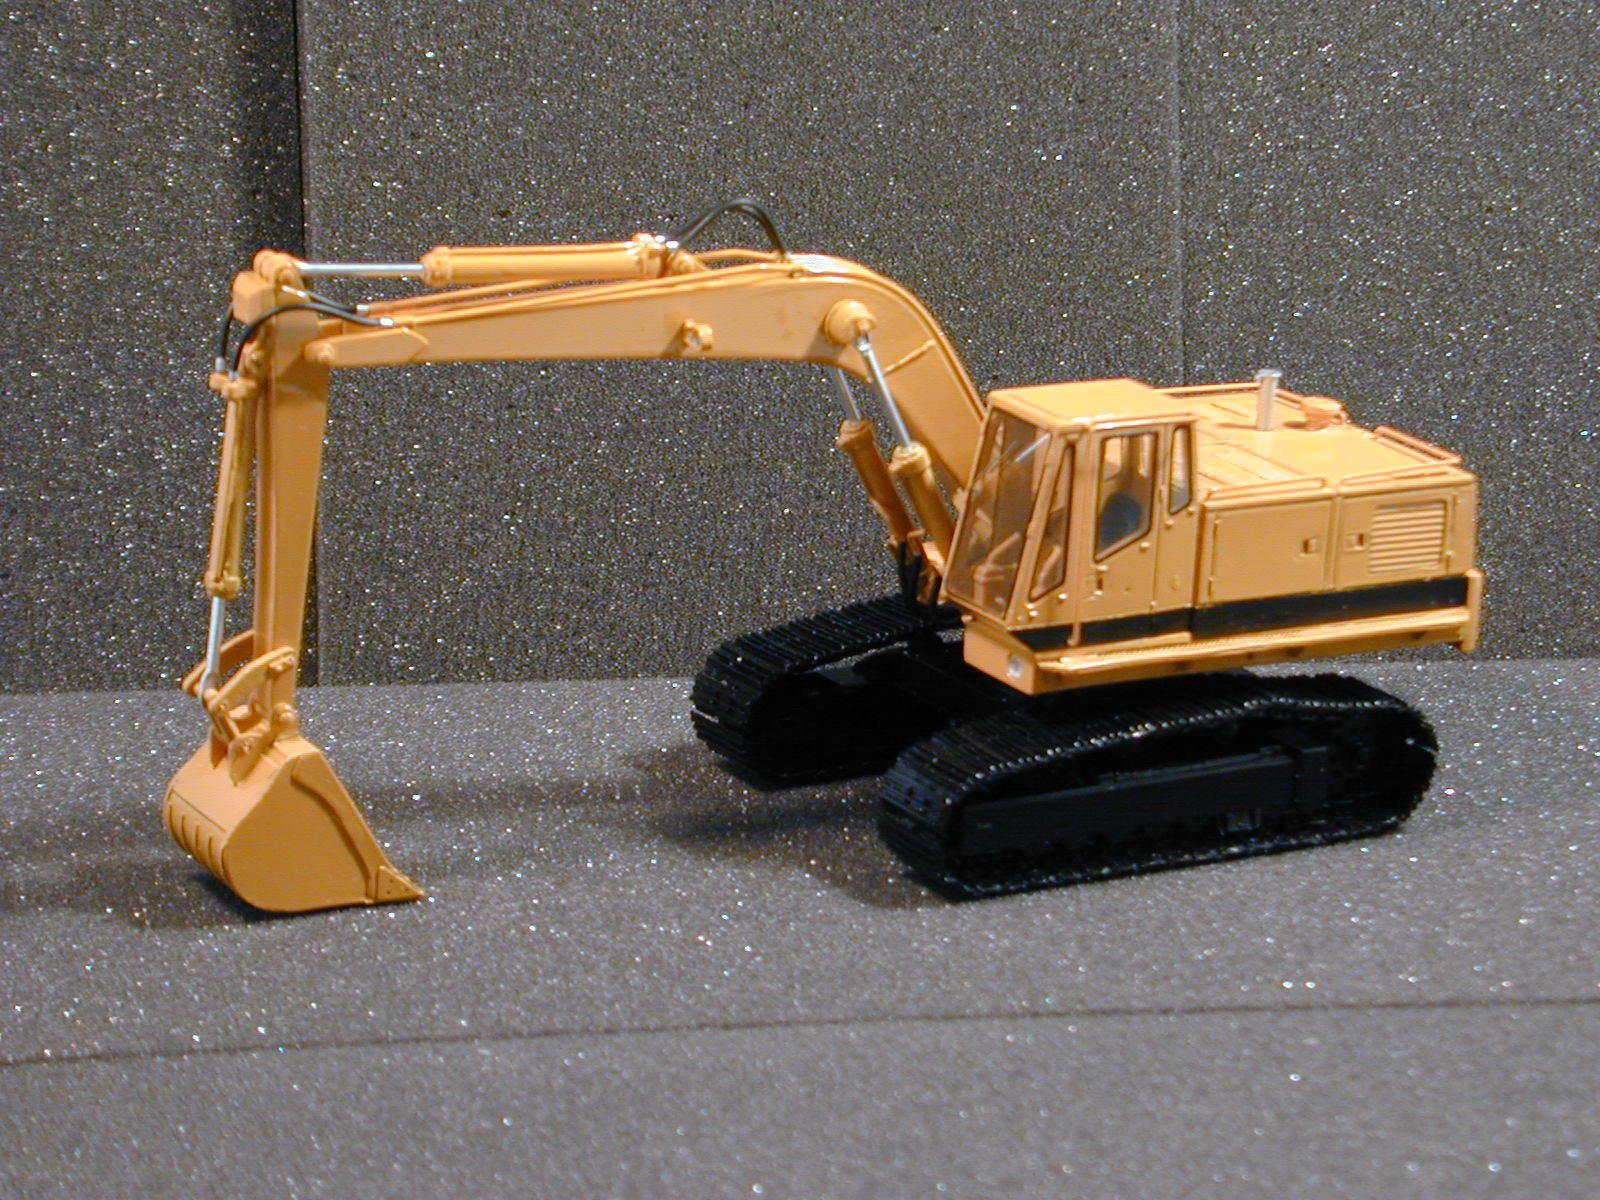 1 50 Excavator C225 - High Quality Resin KIT by MiM Models